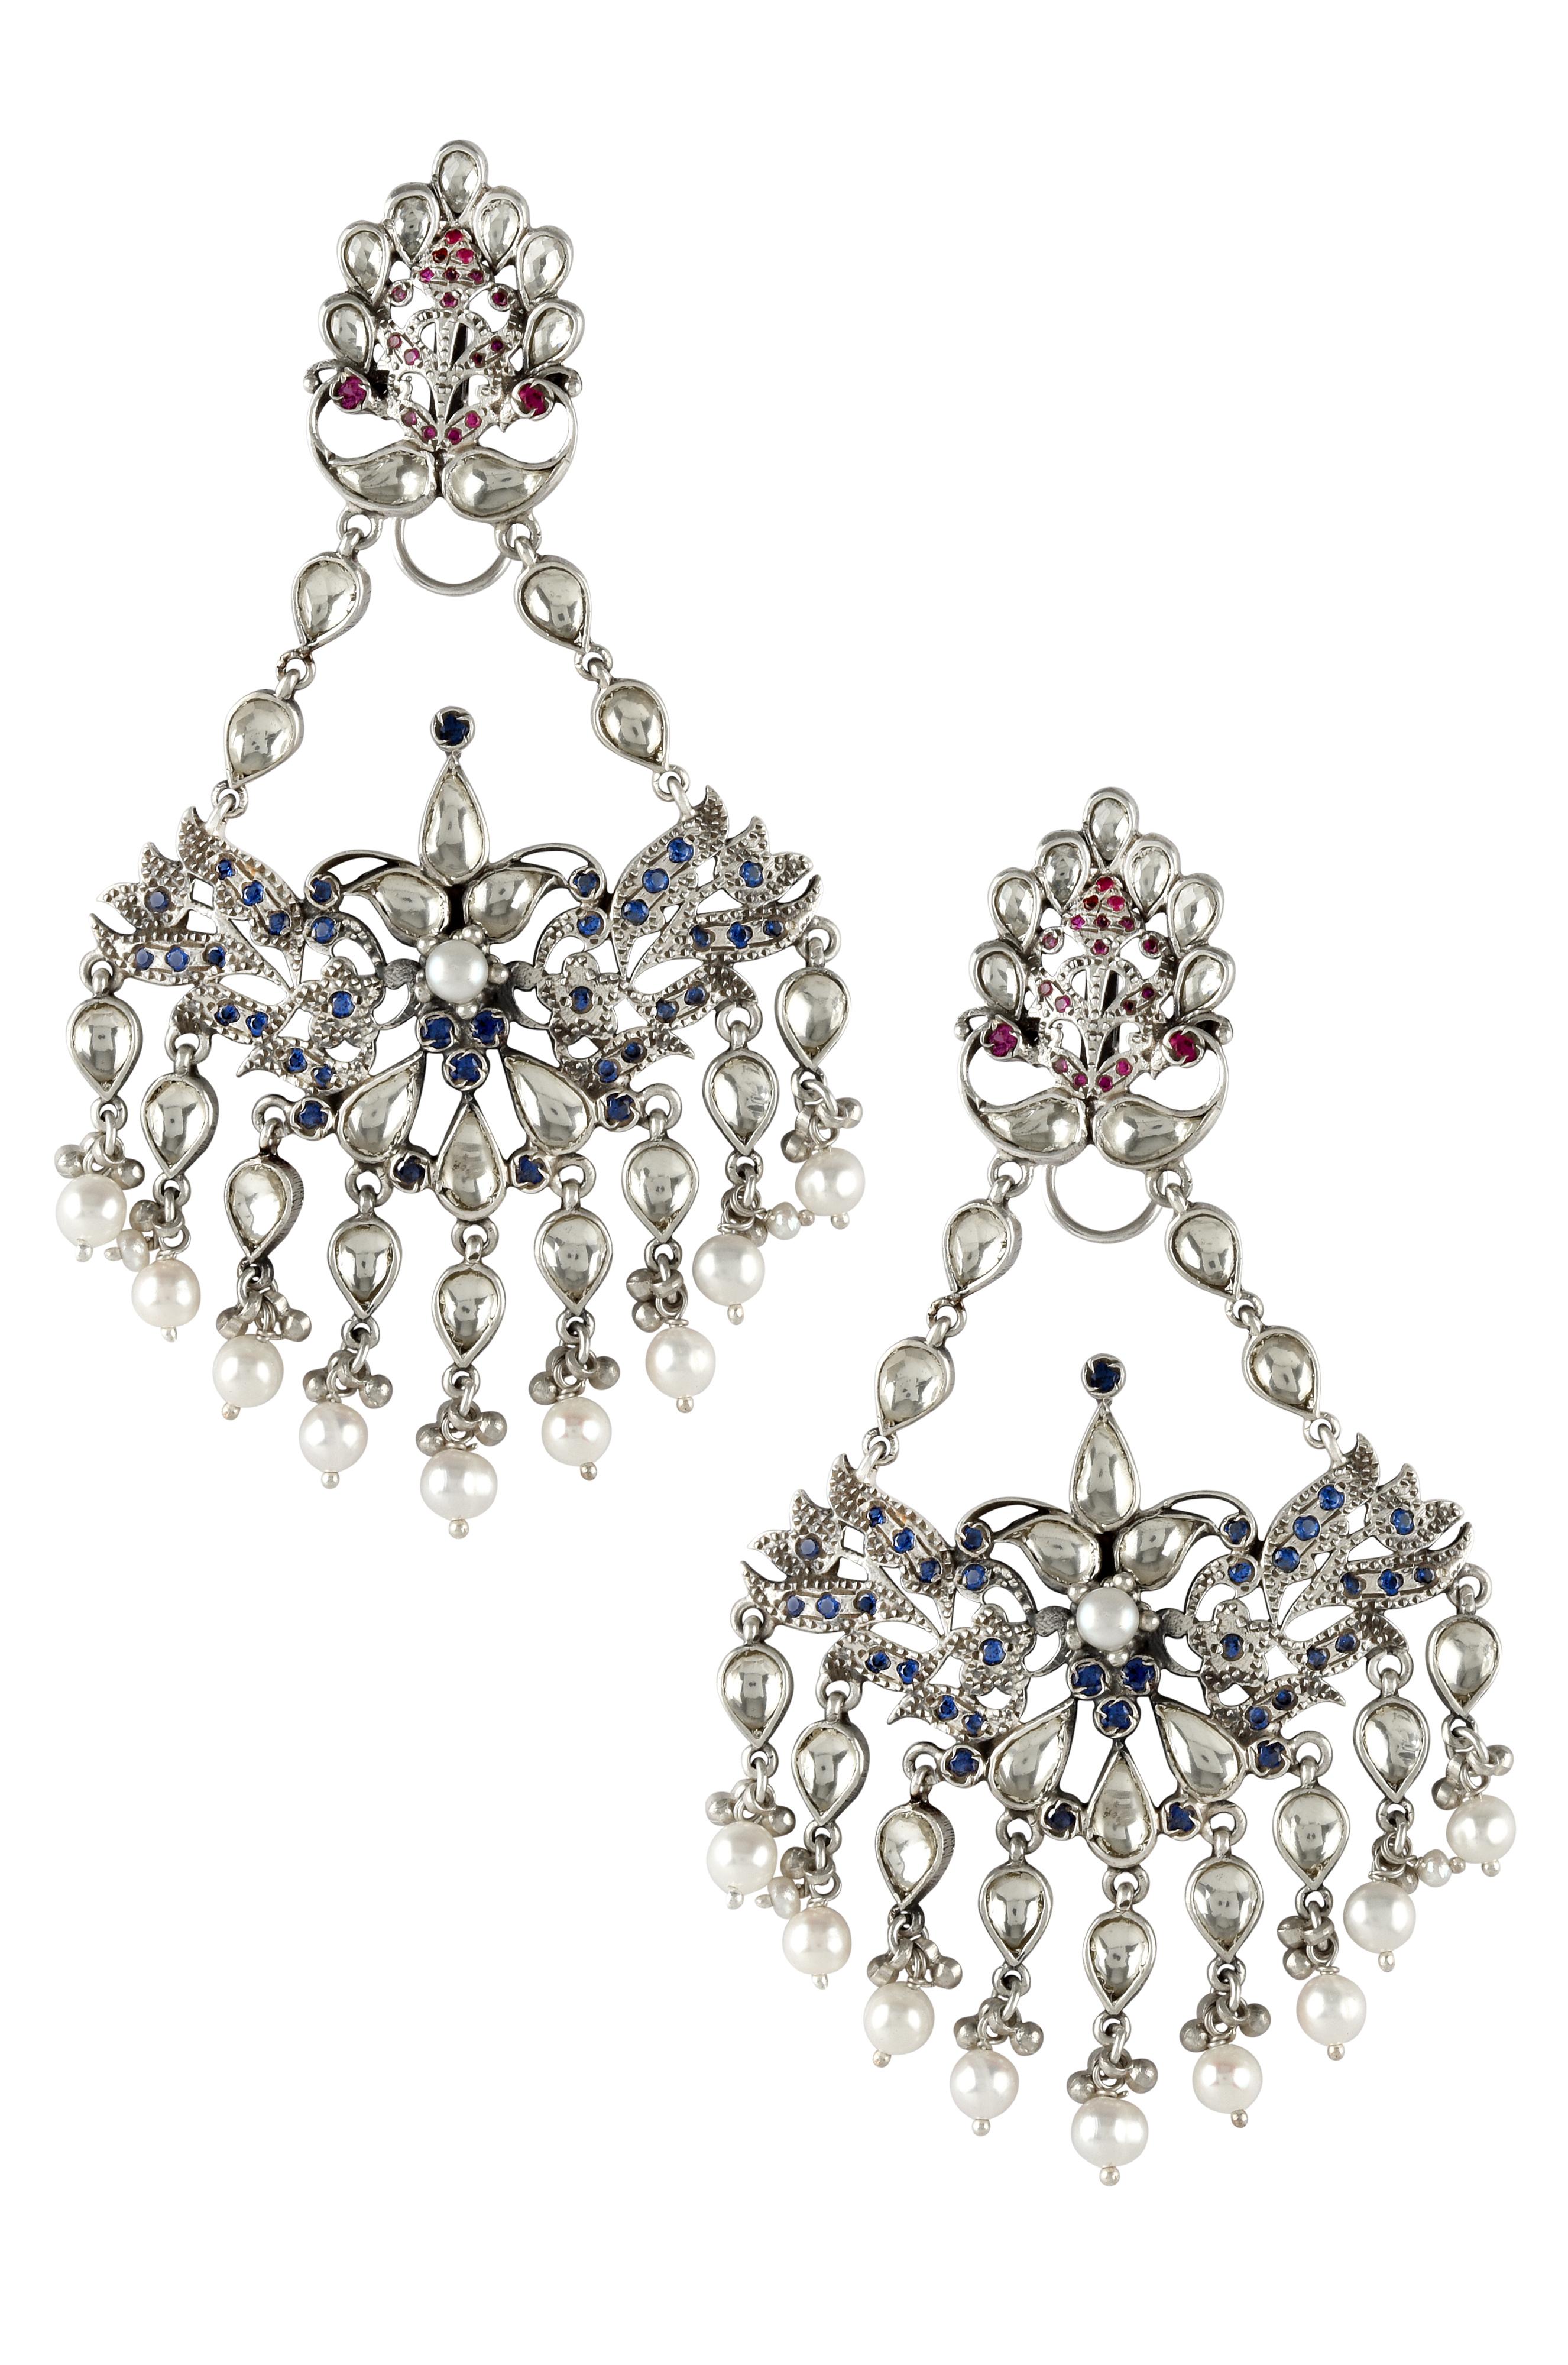 Silver Oxidised Mayura Pearl Drops Earrings